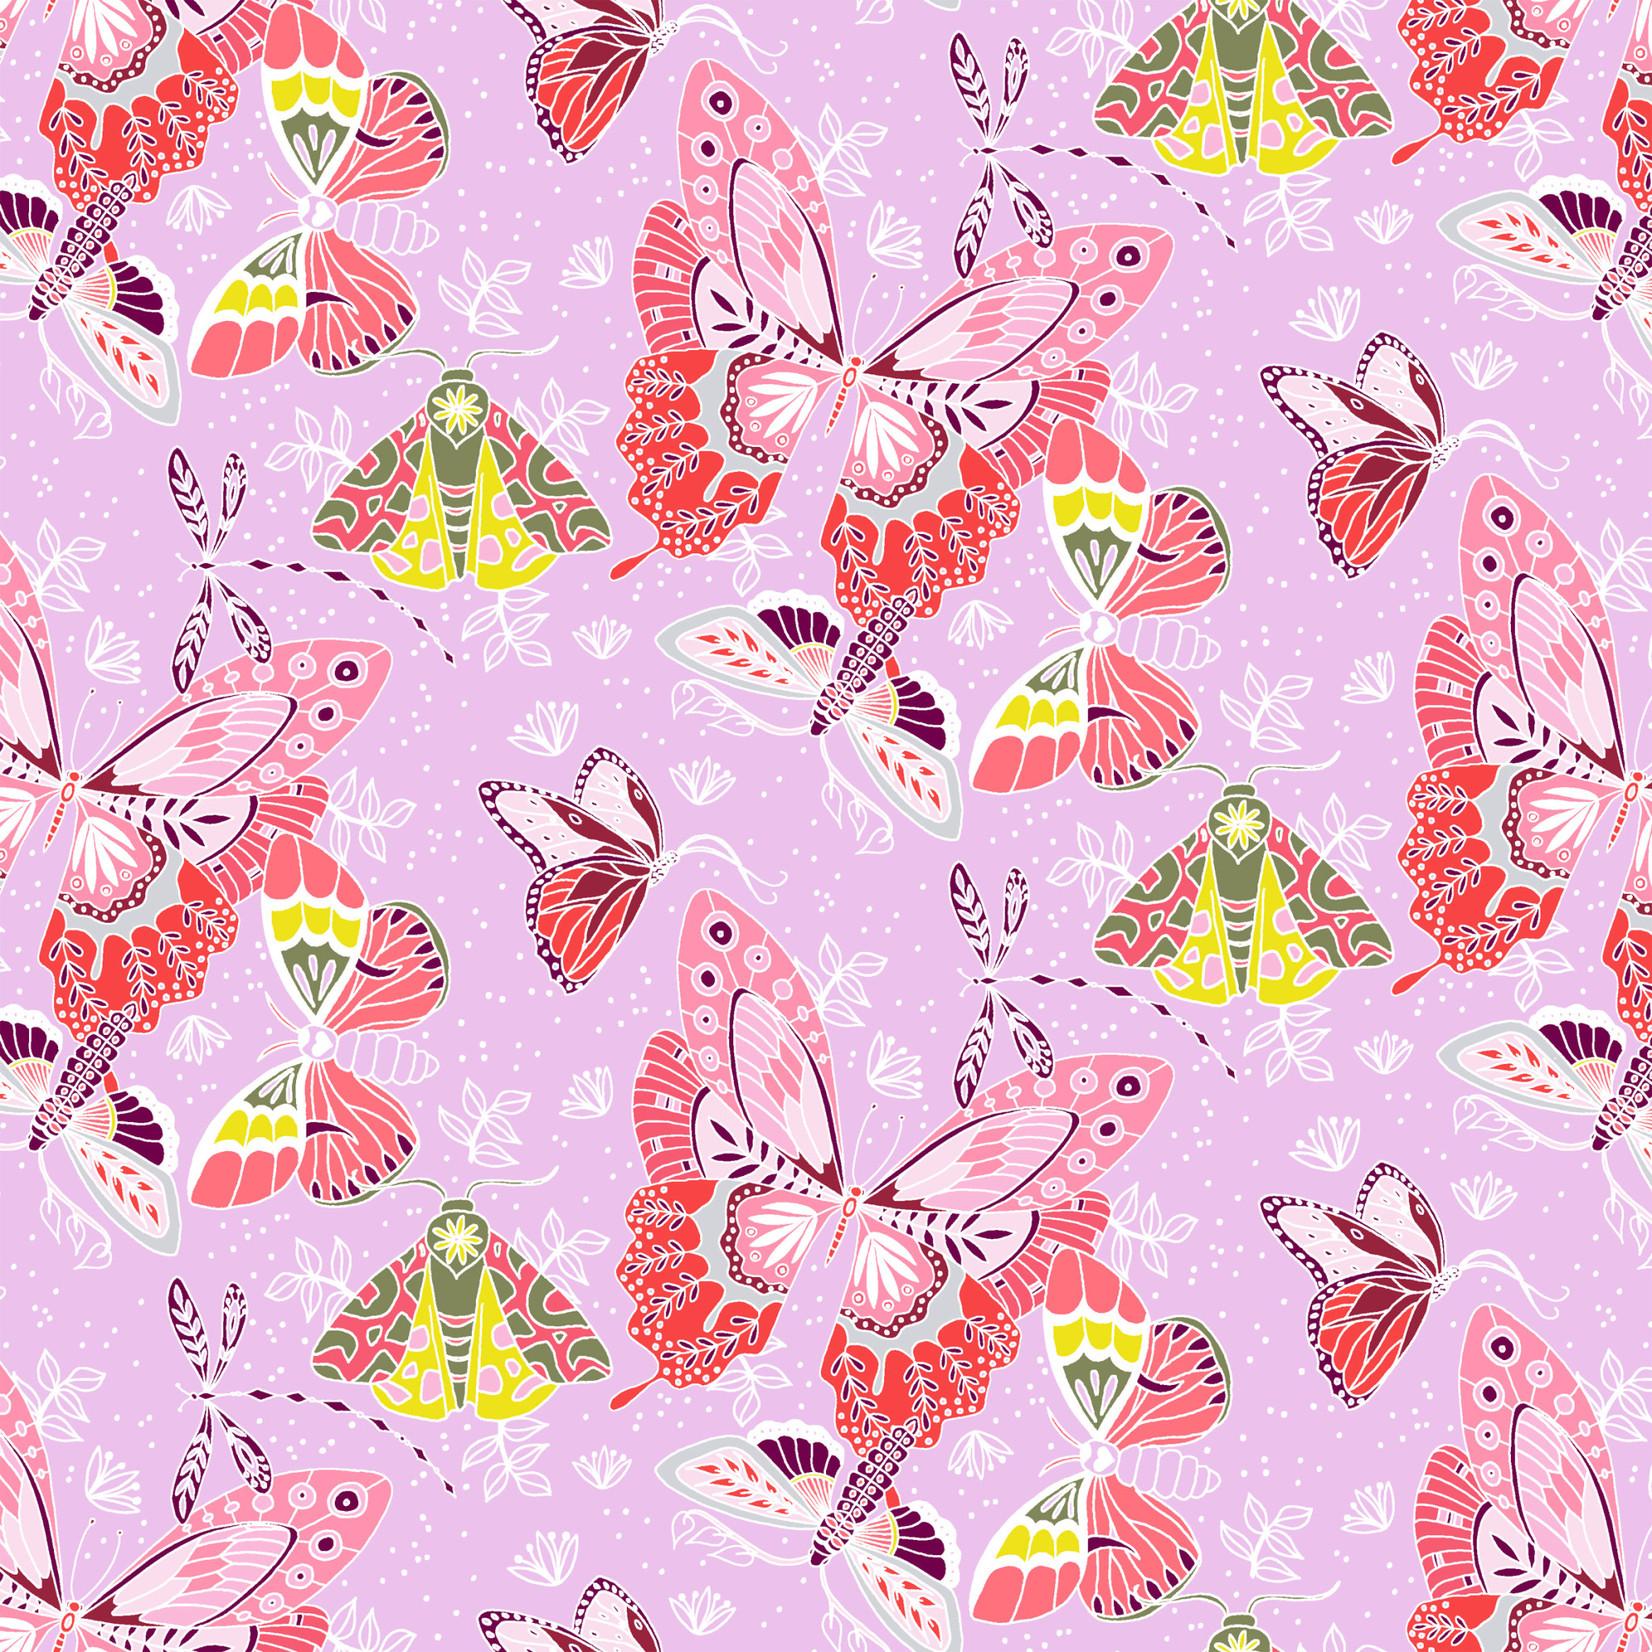 Windham Fabrics Aerial - Flock - Lilac